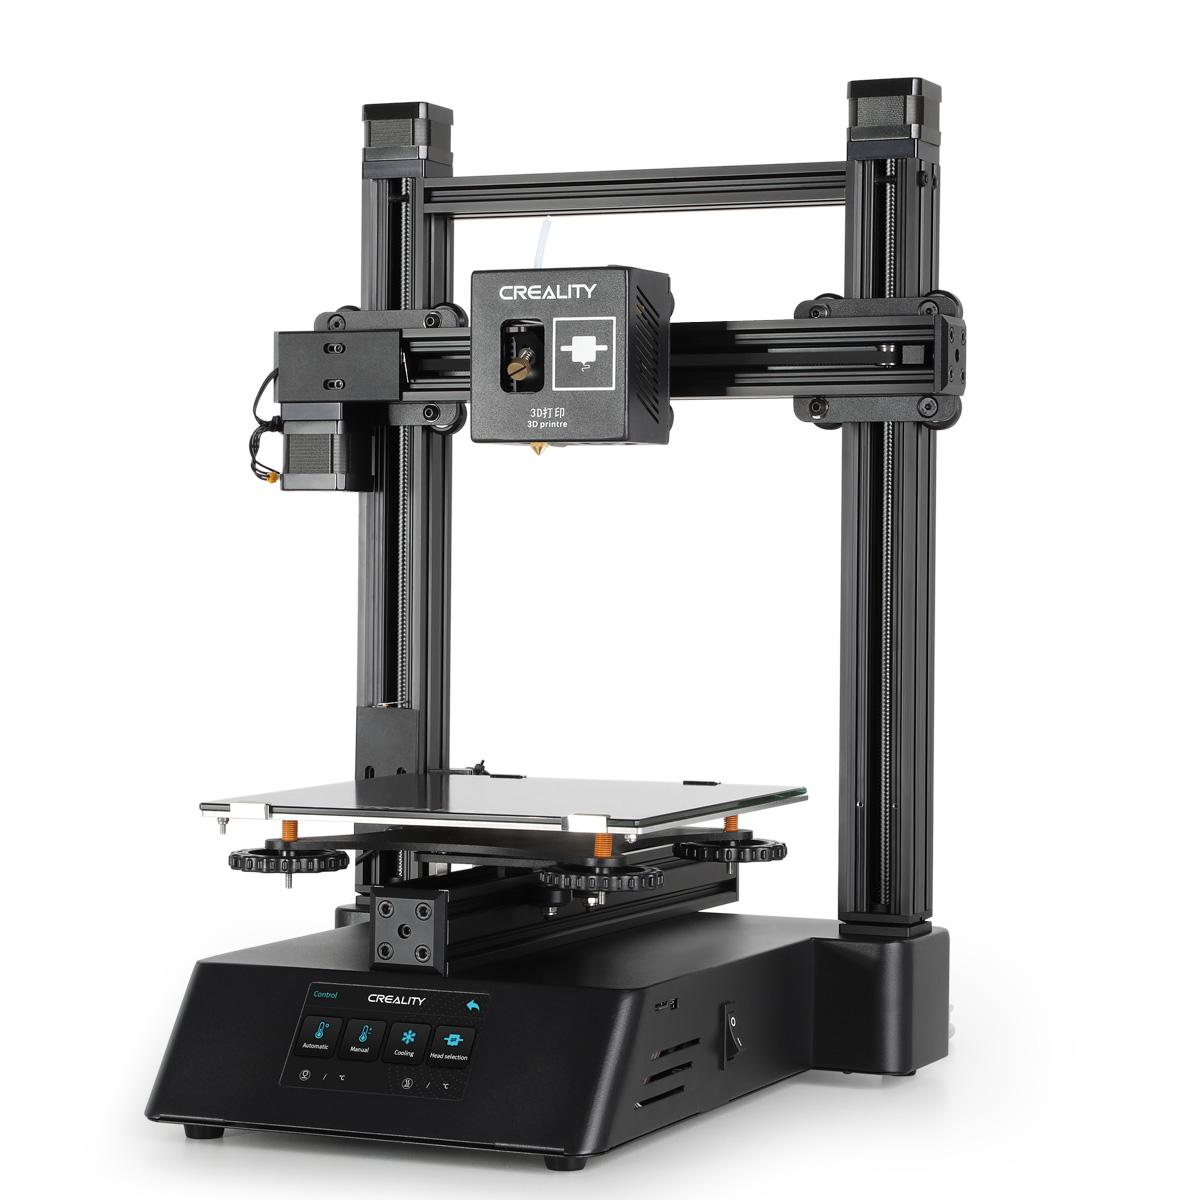 Creality CP-01 3D-Printer / CNC / Laser Engraving